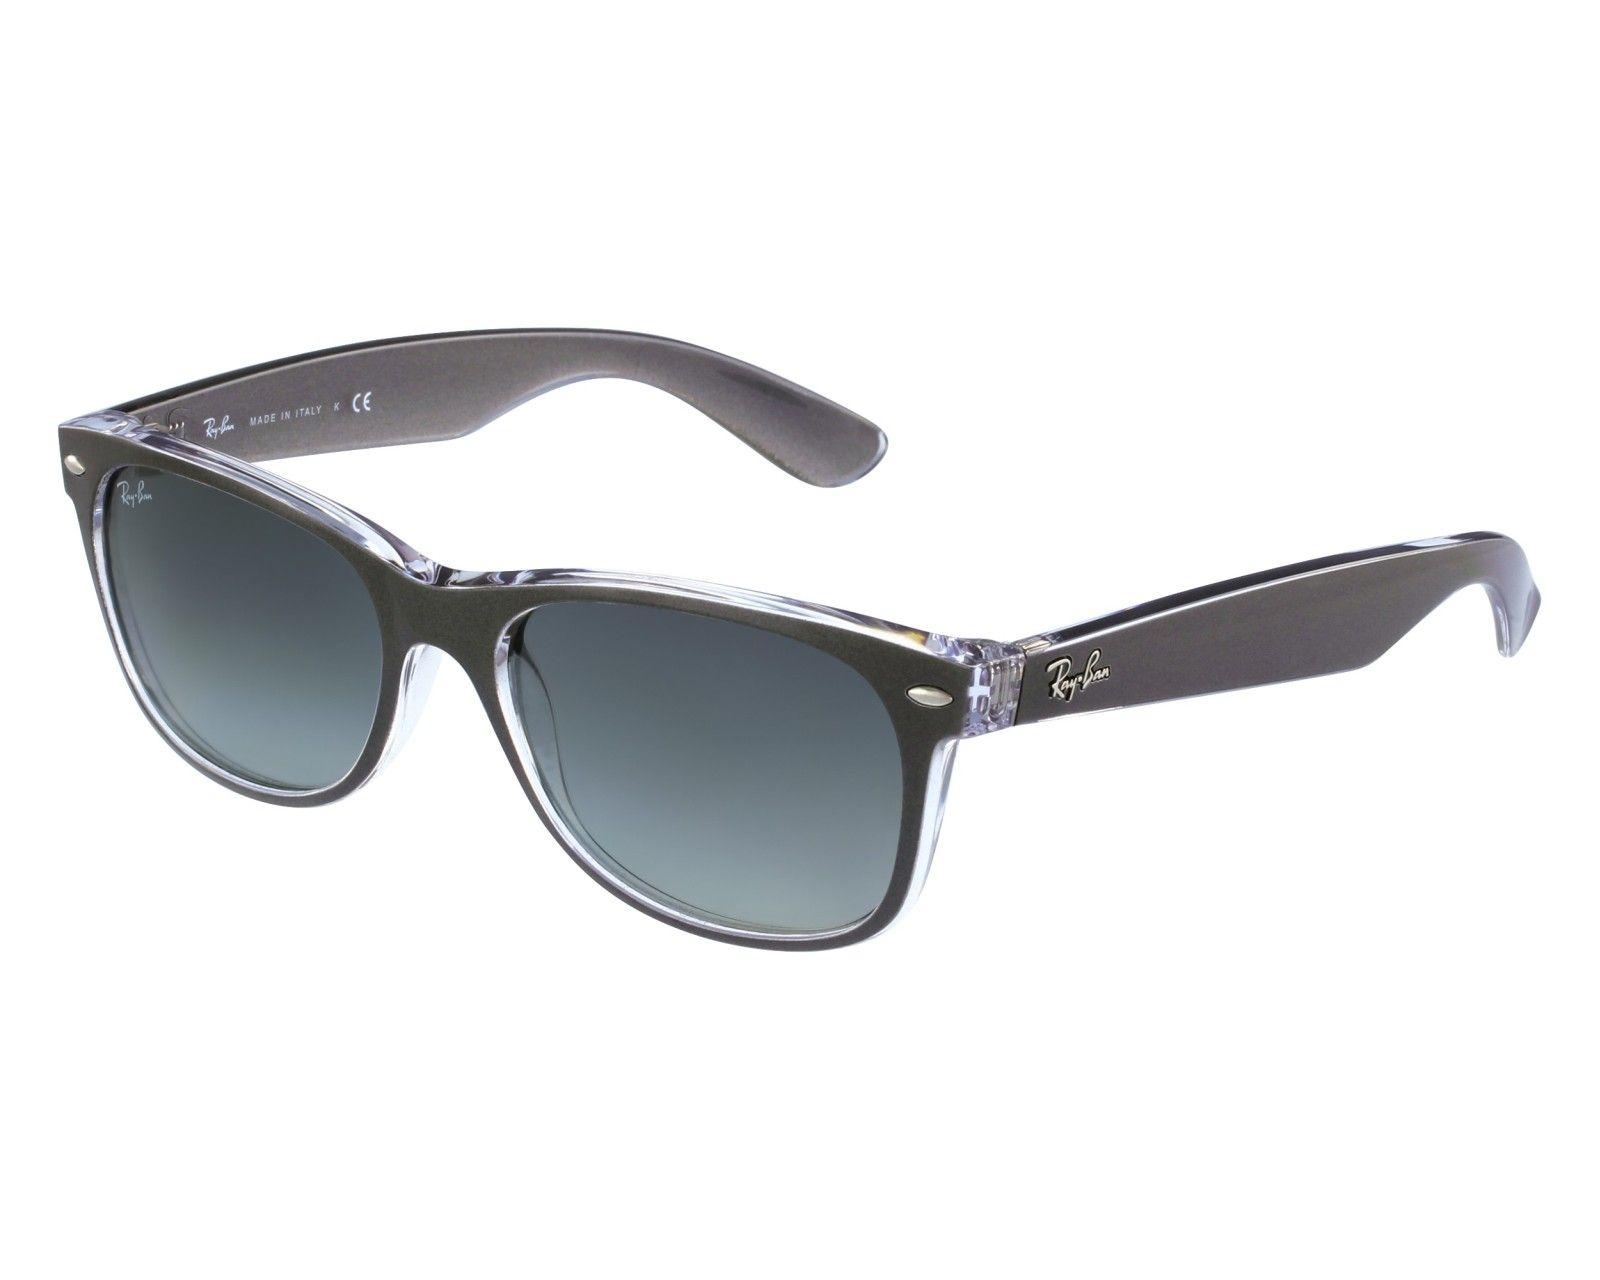 70c54867d5 Shop online for Ray Ban sunglasses RB2132 6143 71 New Wayfarer Dark Grey.  Item